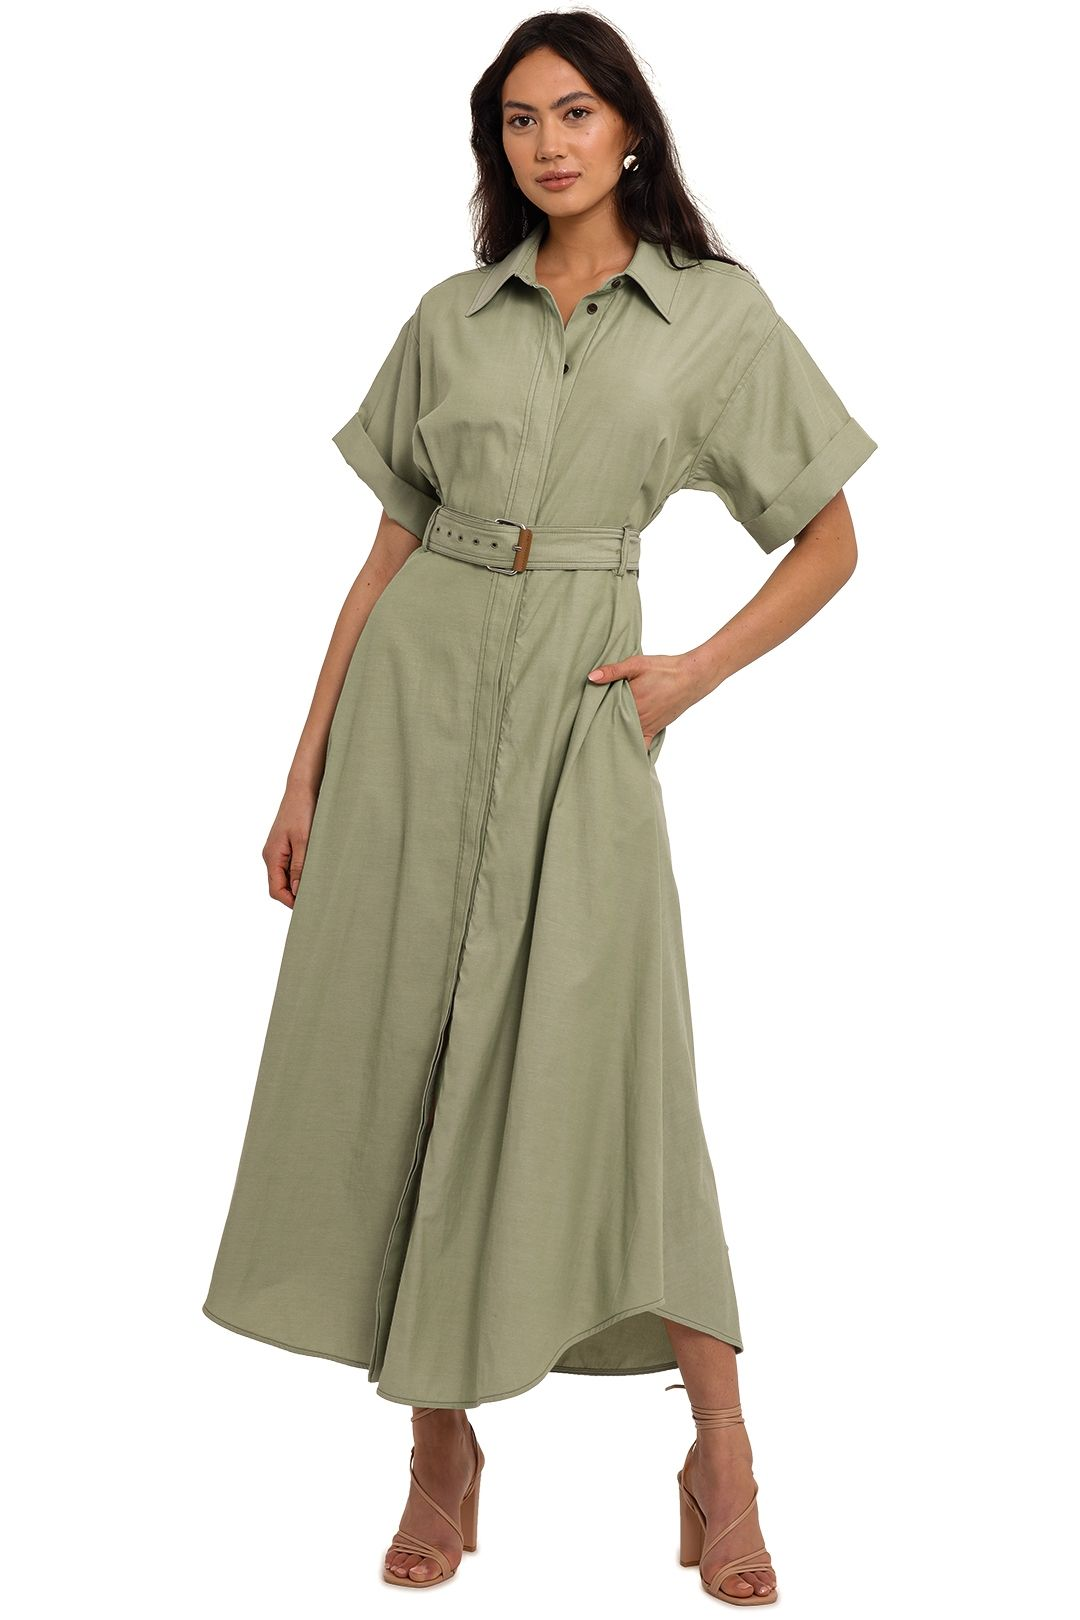 Camilla and Marc Finke Midi Shirt Dress full skirt